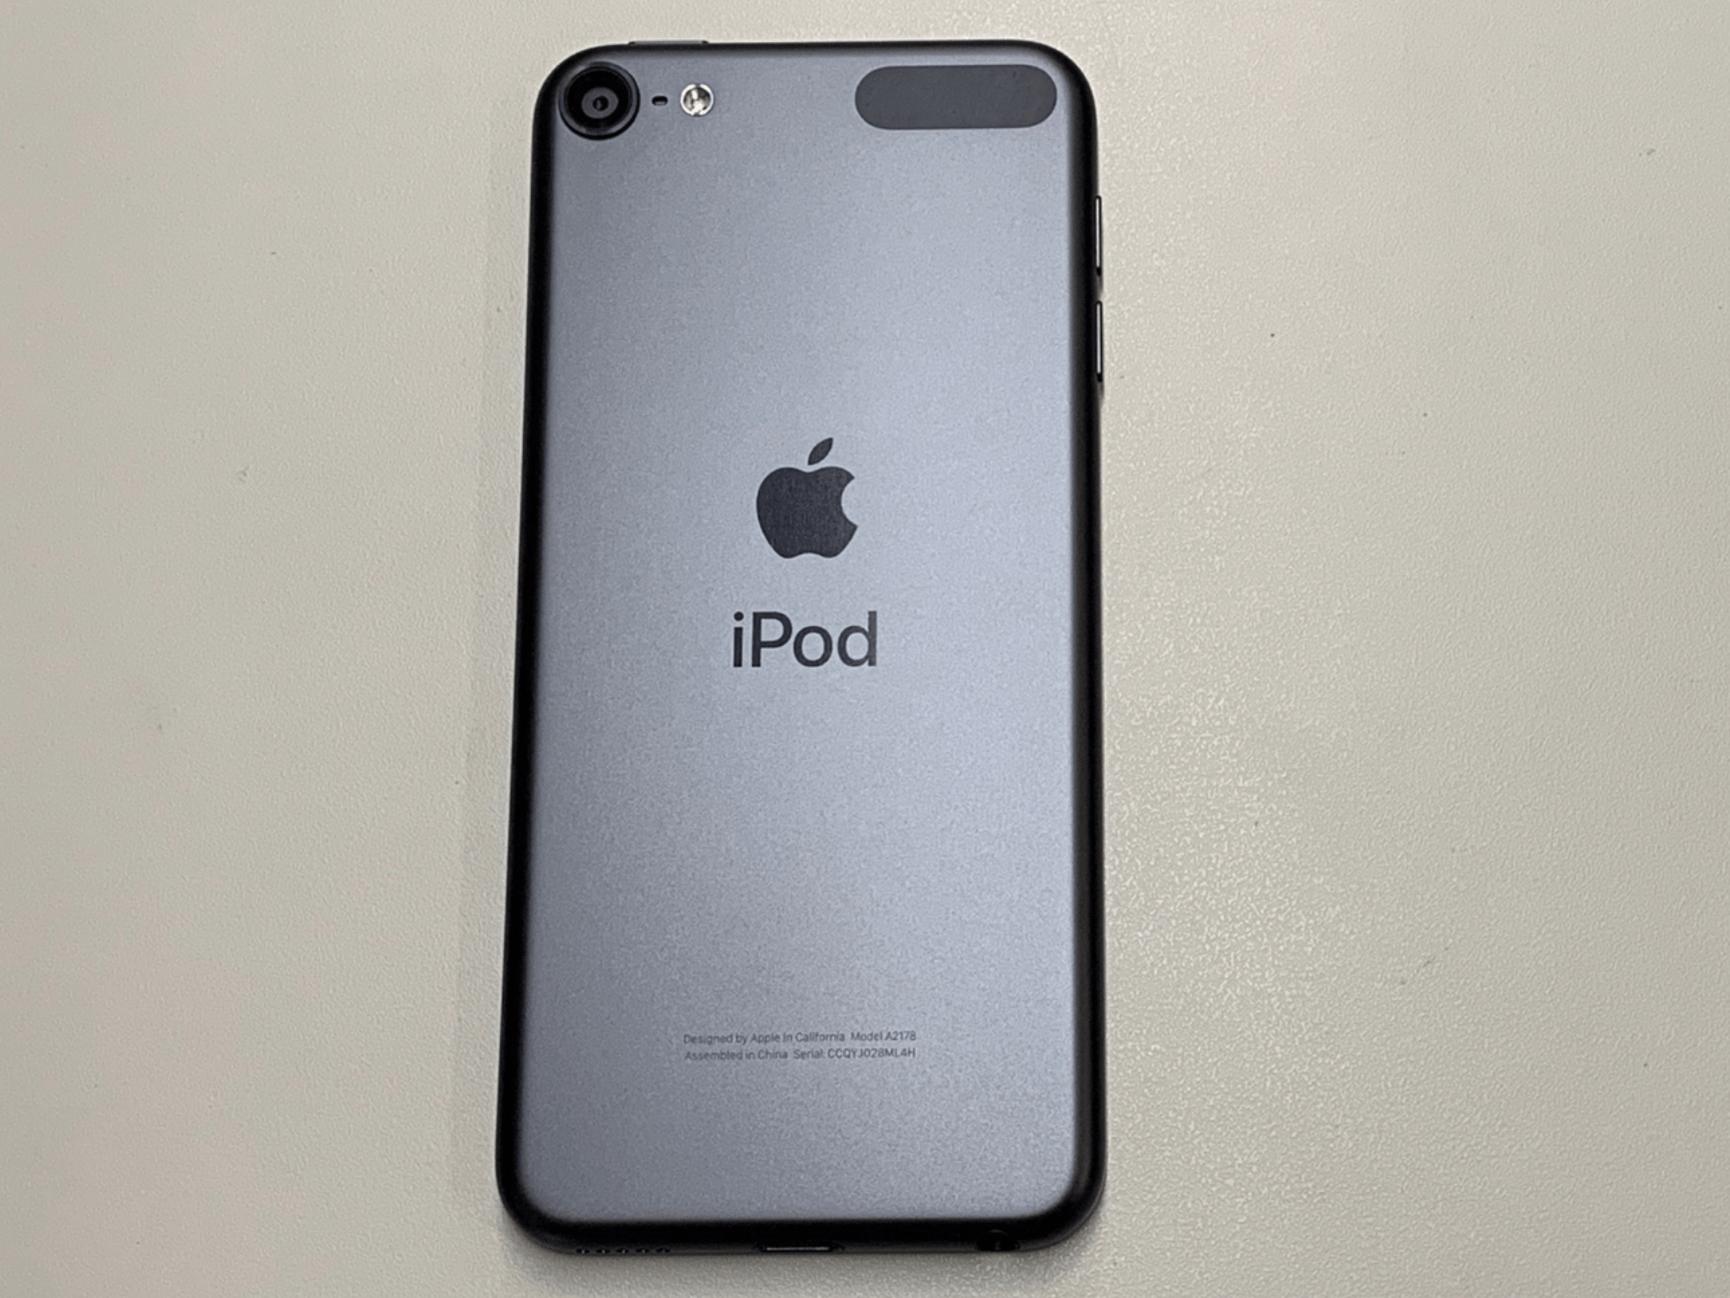 Novo iPod touch homologado pela Anatel